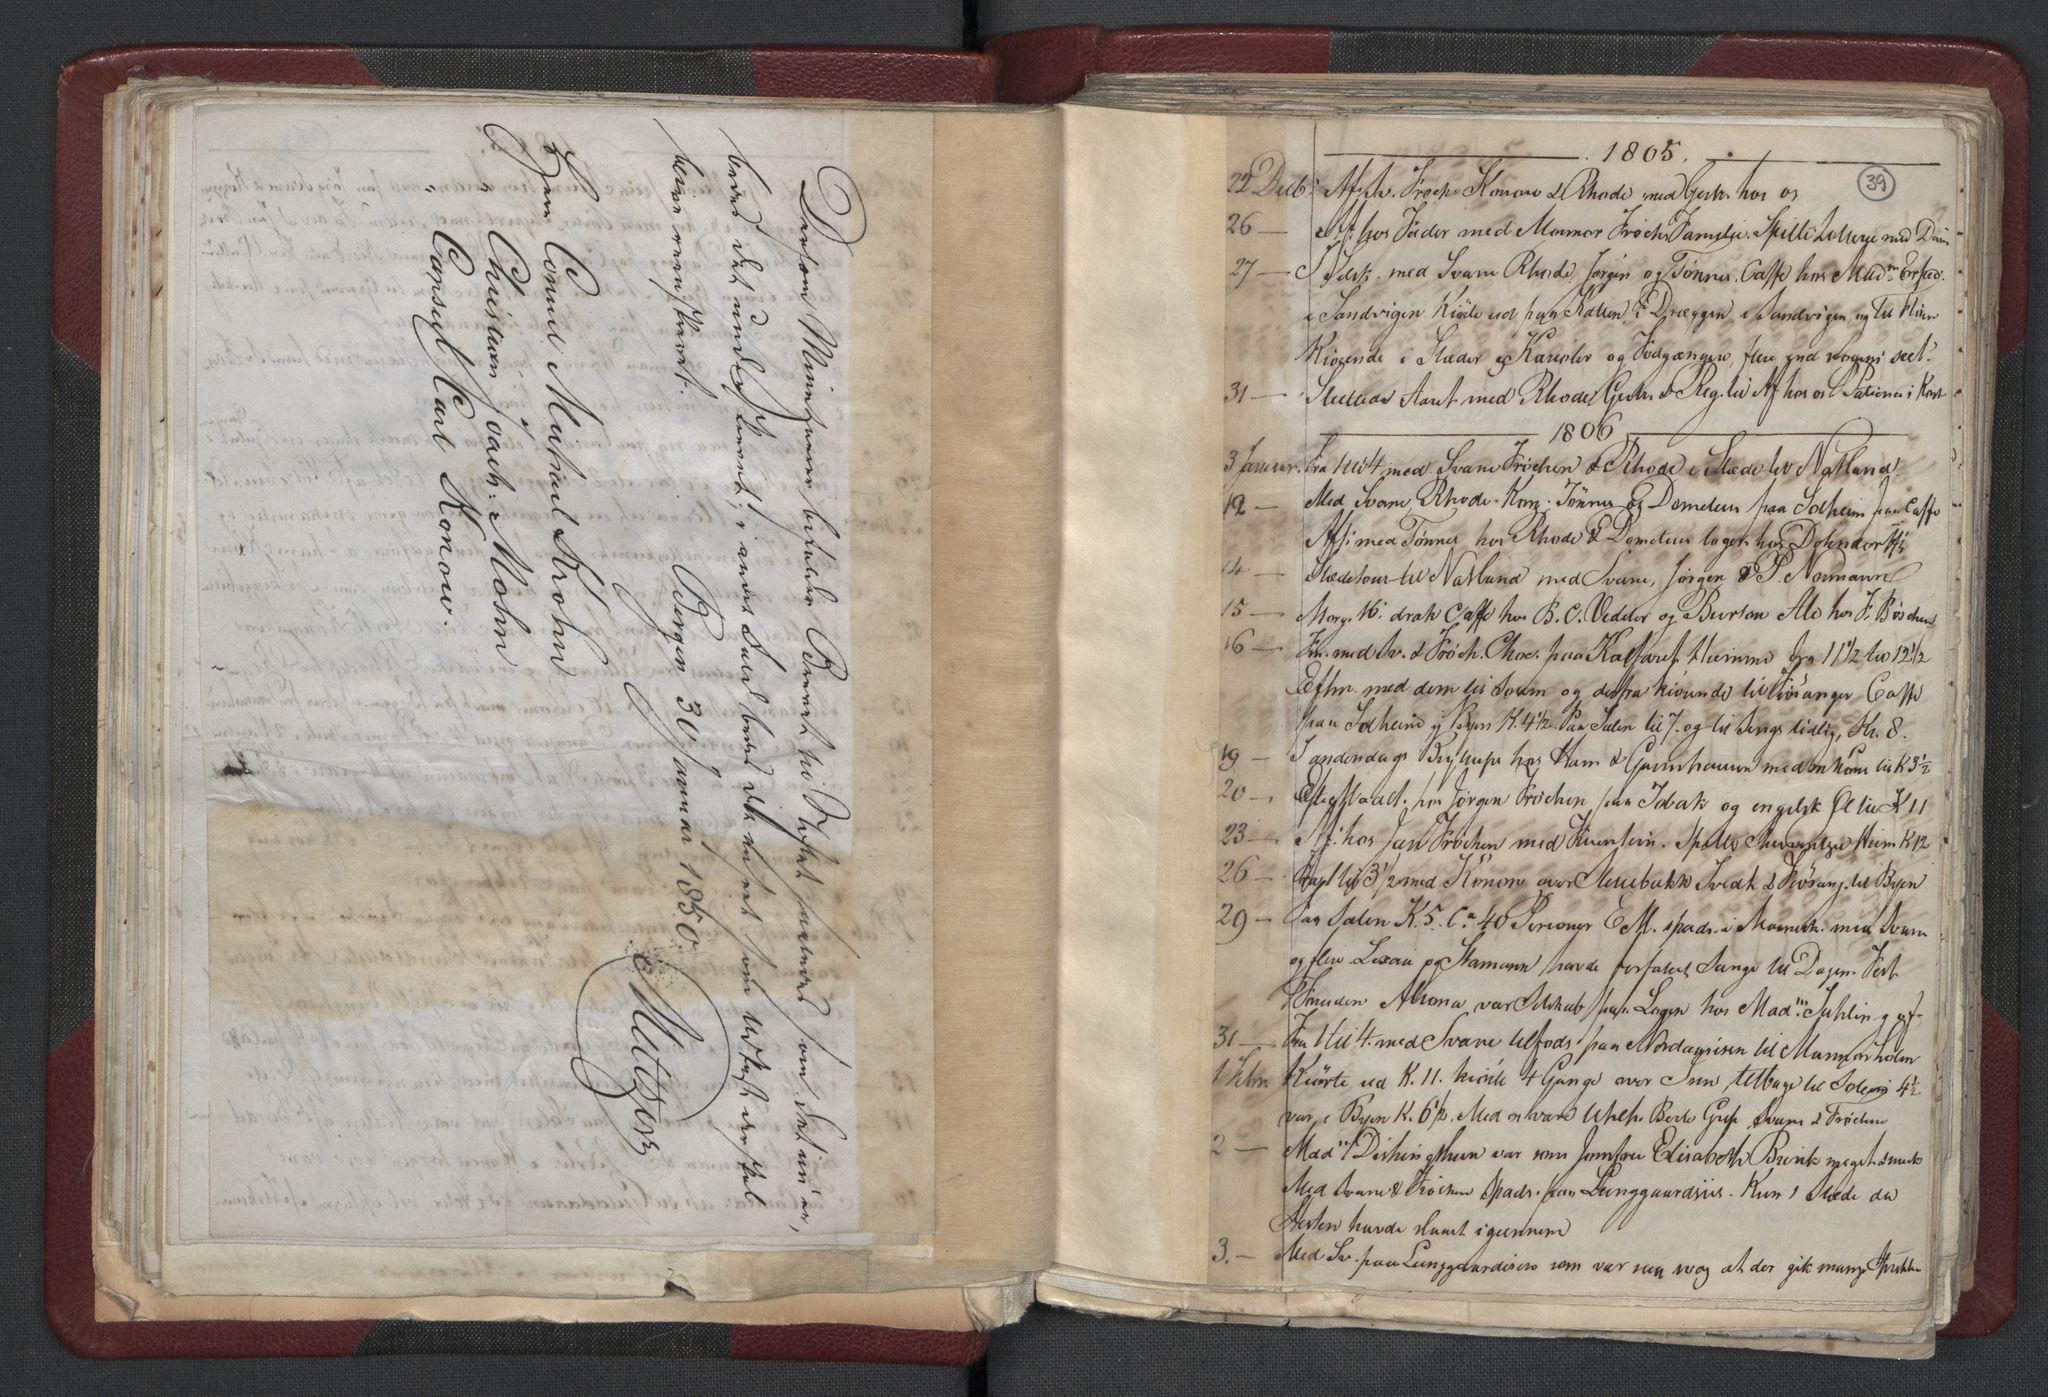 RA, Meltzer, Fredrik, F/L0001: Dagbok for årene 1796-1808, 1811, 1817, 1796-1817, s. 38b-39a